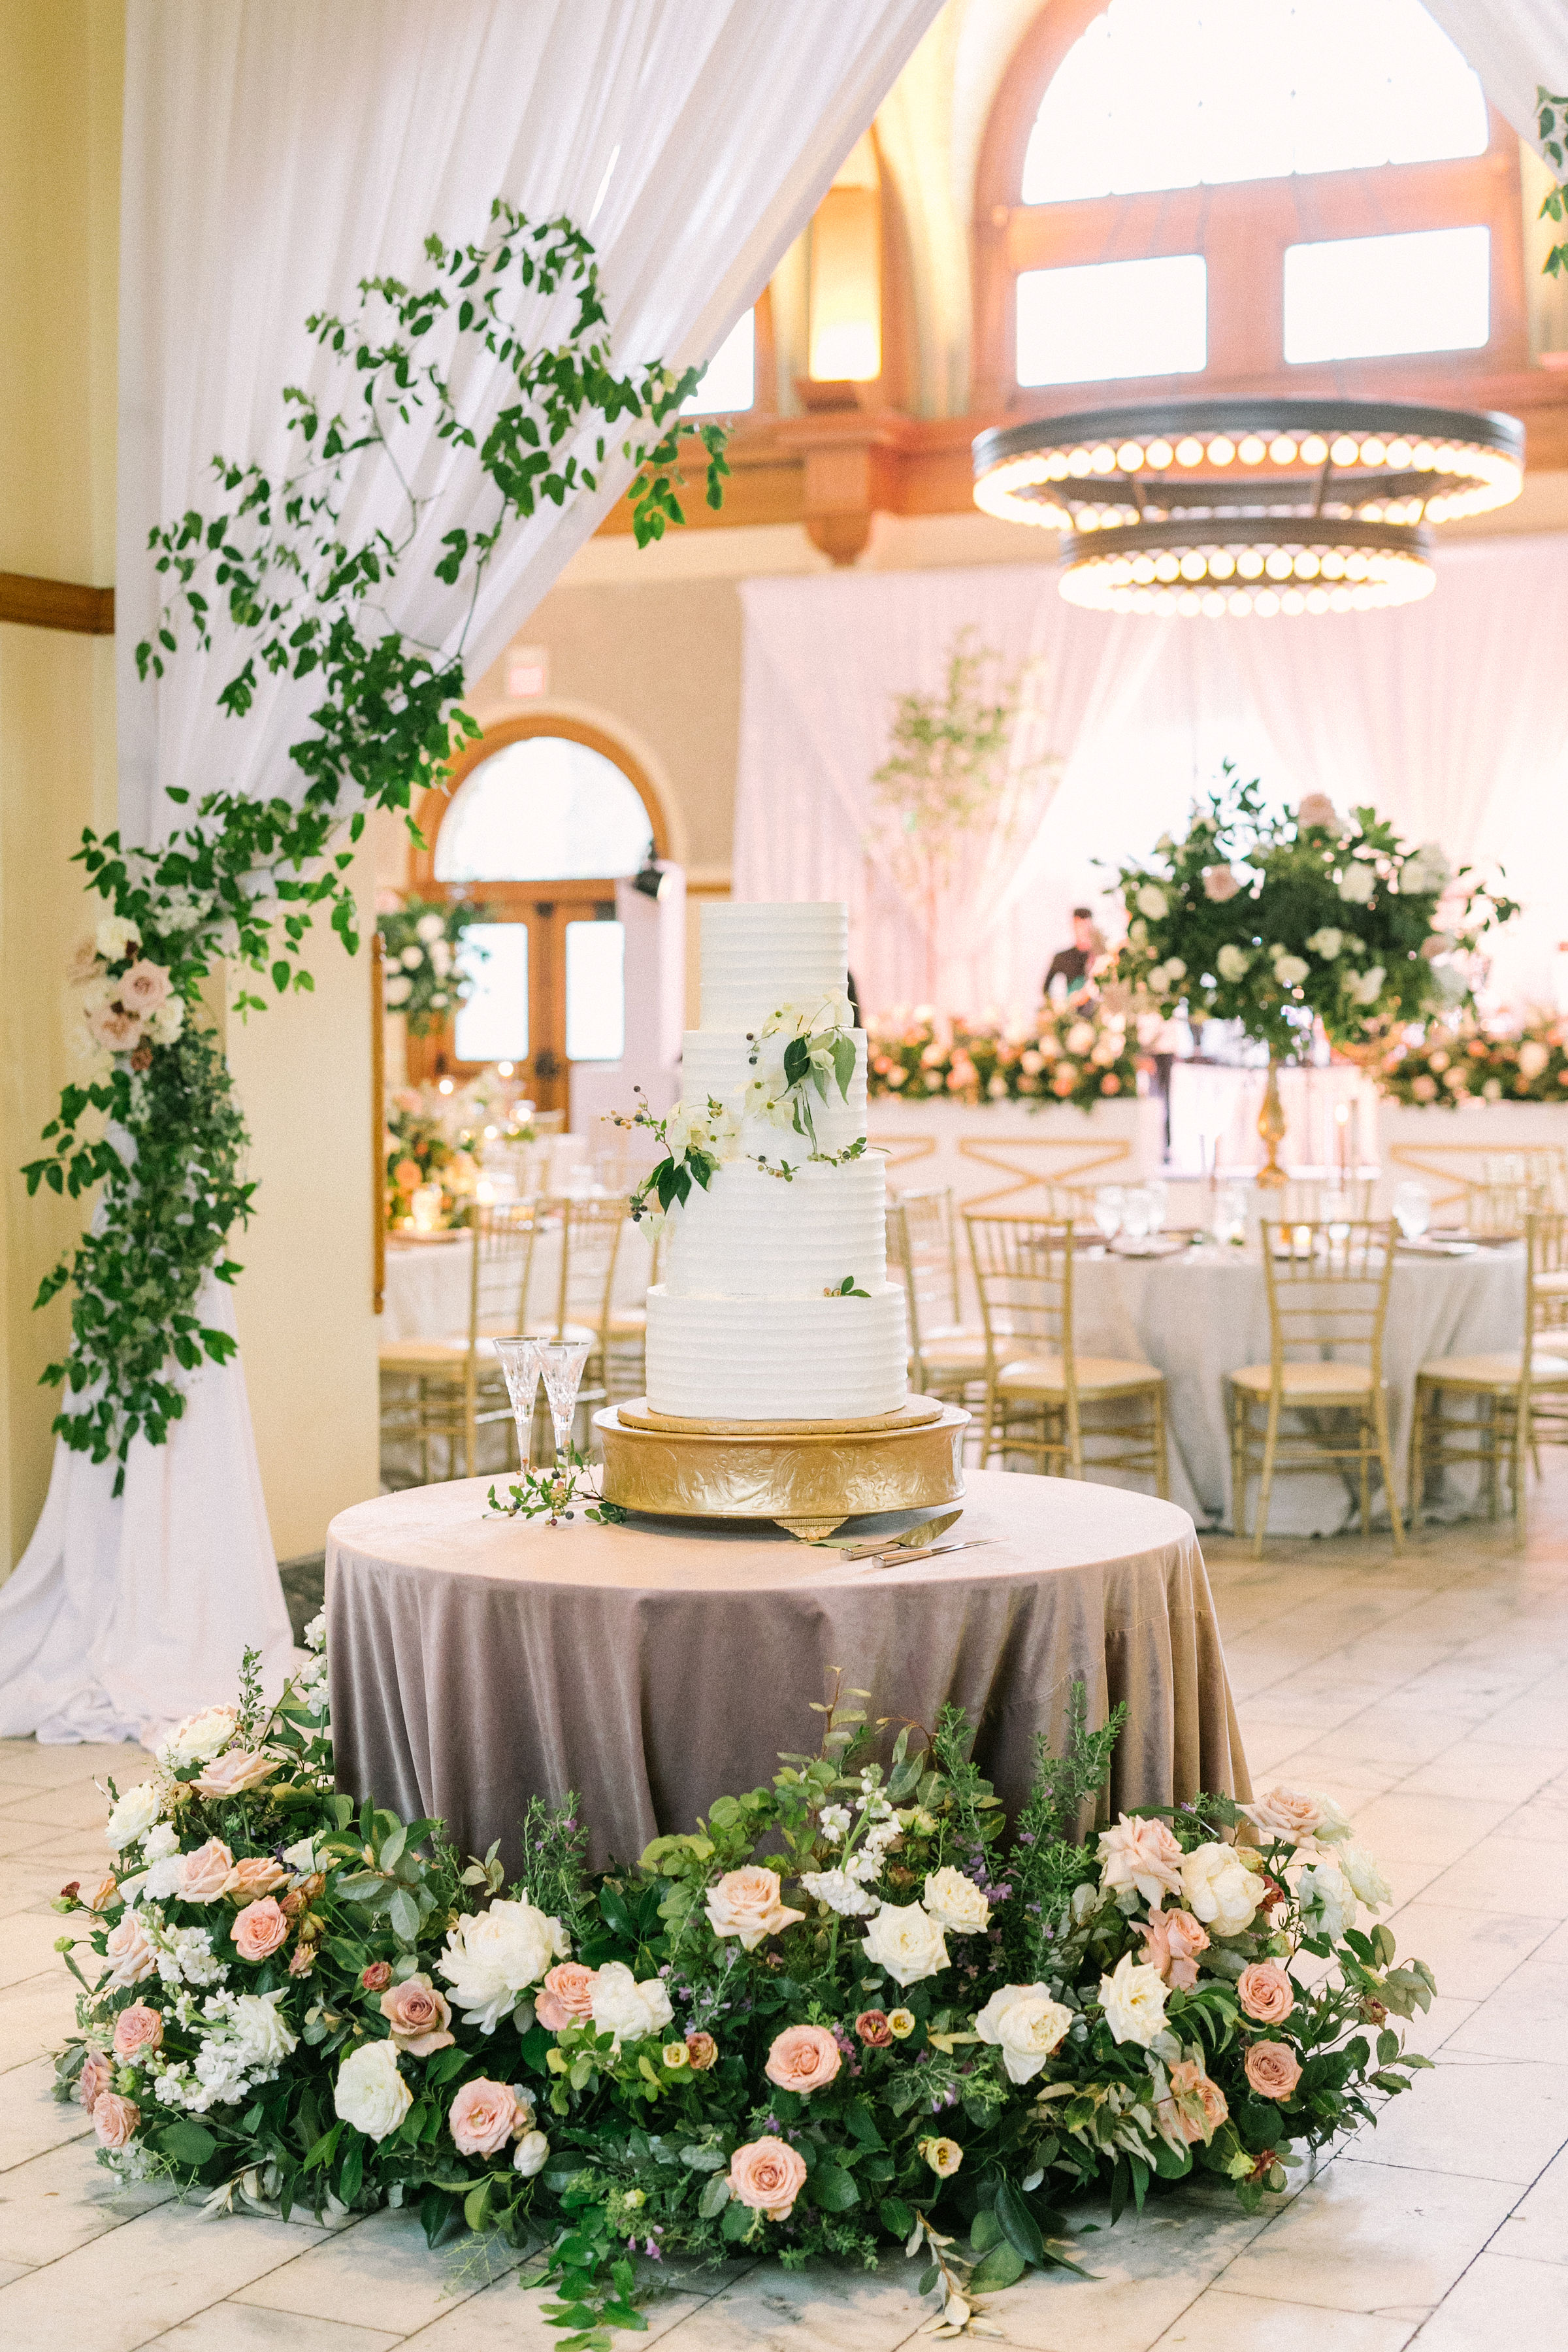 Ellen-Ashton-Photography-Girt-and-gold-events-weddings-Ashton-Depot-Weddings1061.jpg